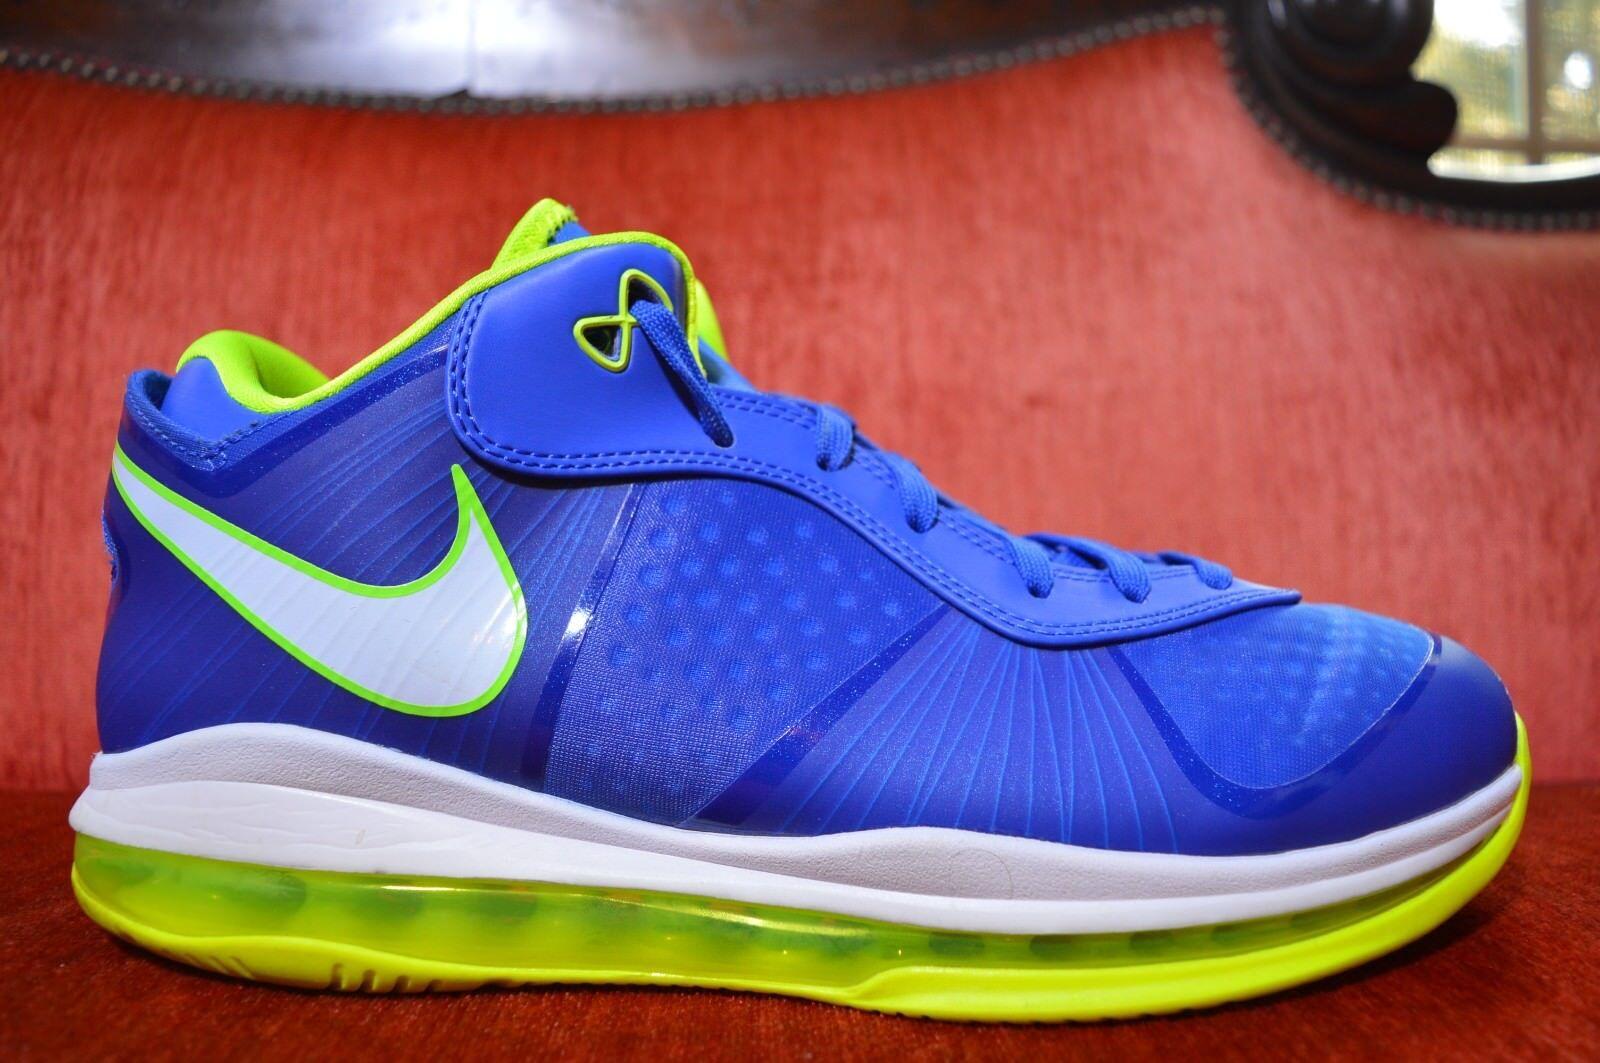 Nike Air Max LEBRON VIII 8 V/2 LOW SPRITE TREASURE BLUE WHITE BLACK VOLT 10.5